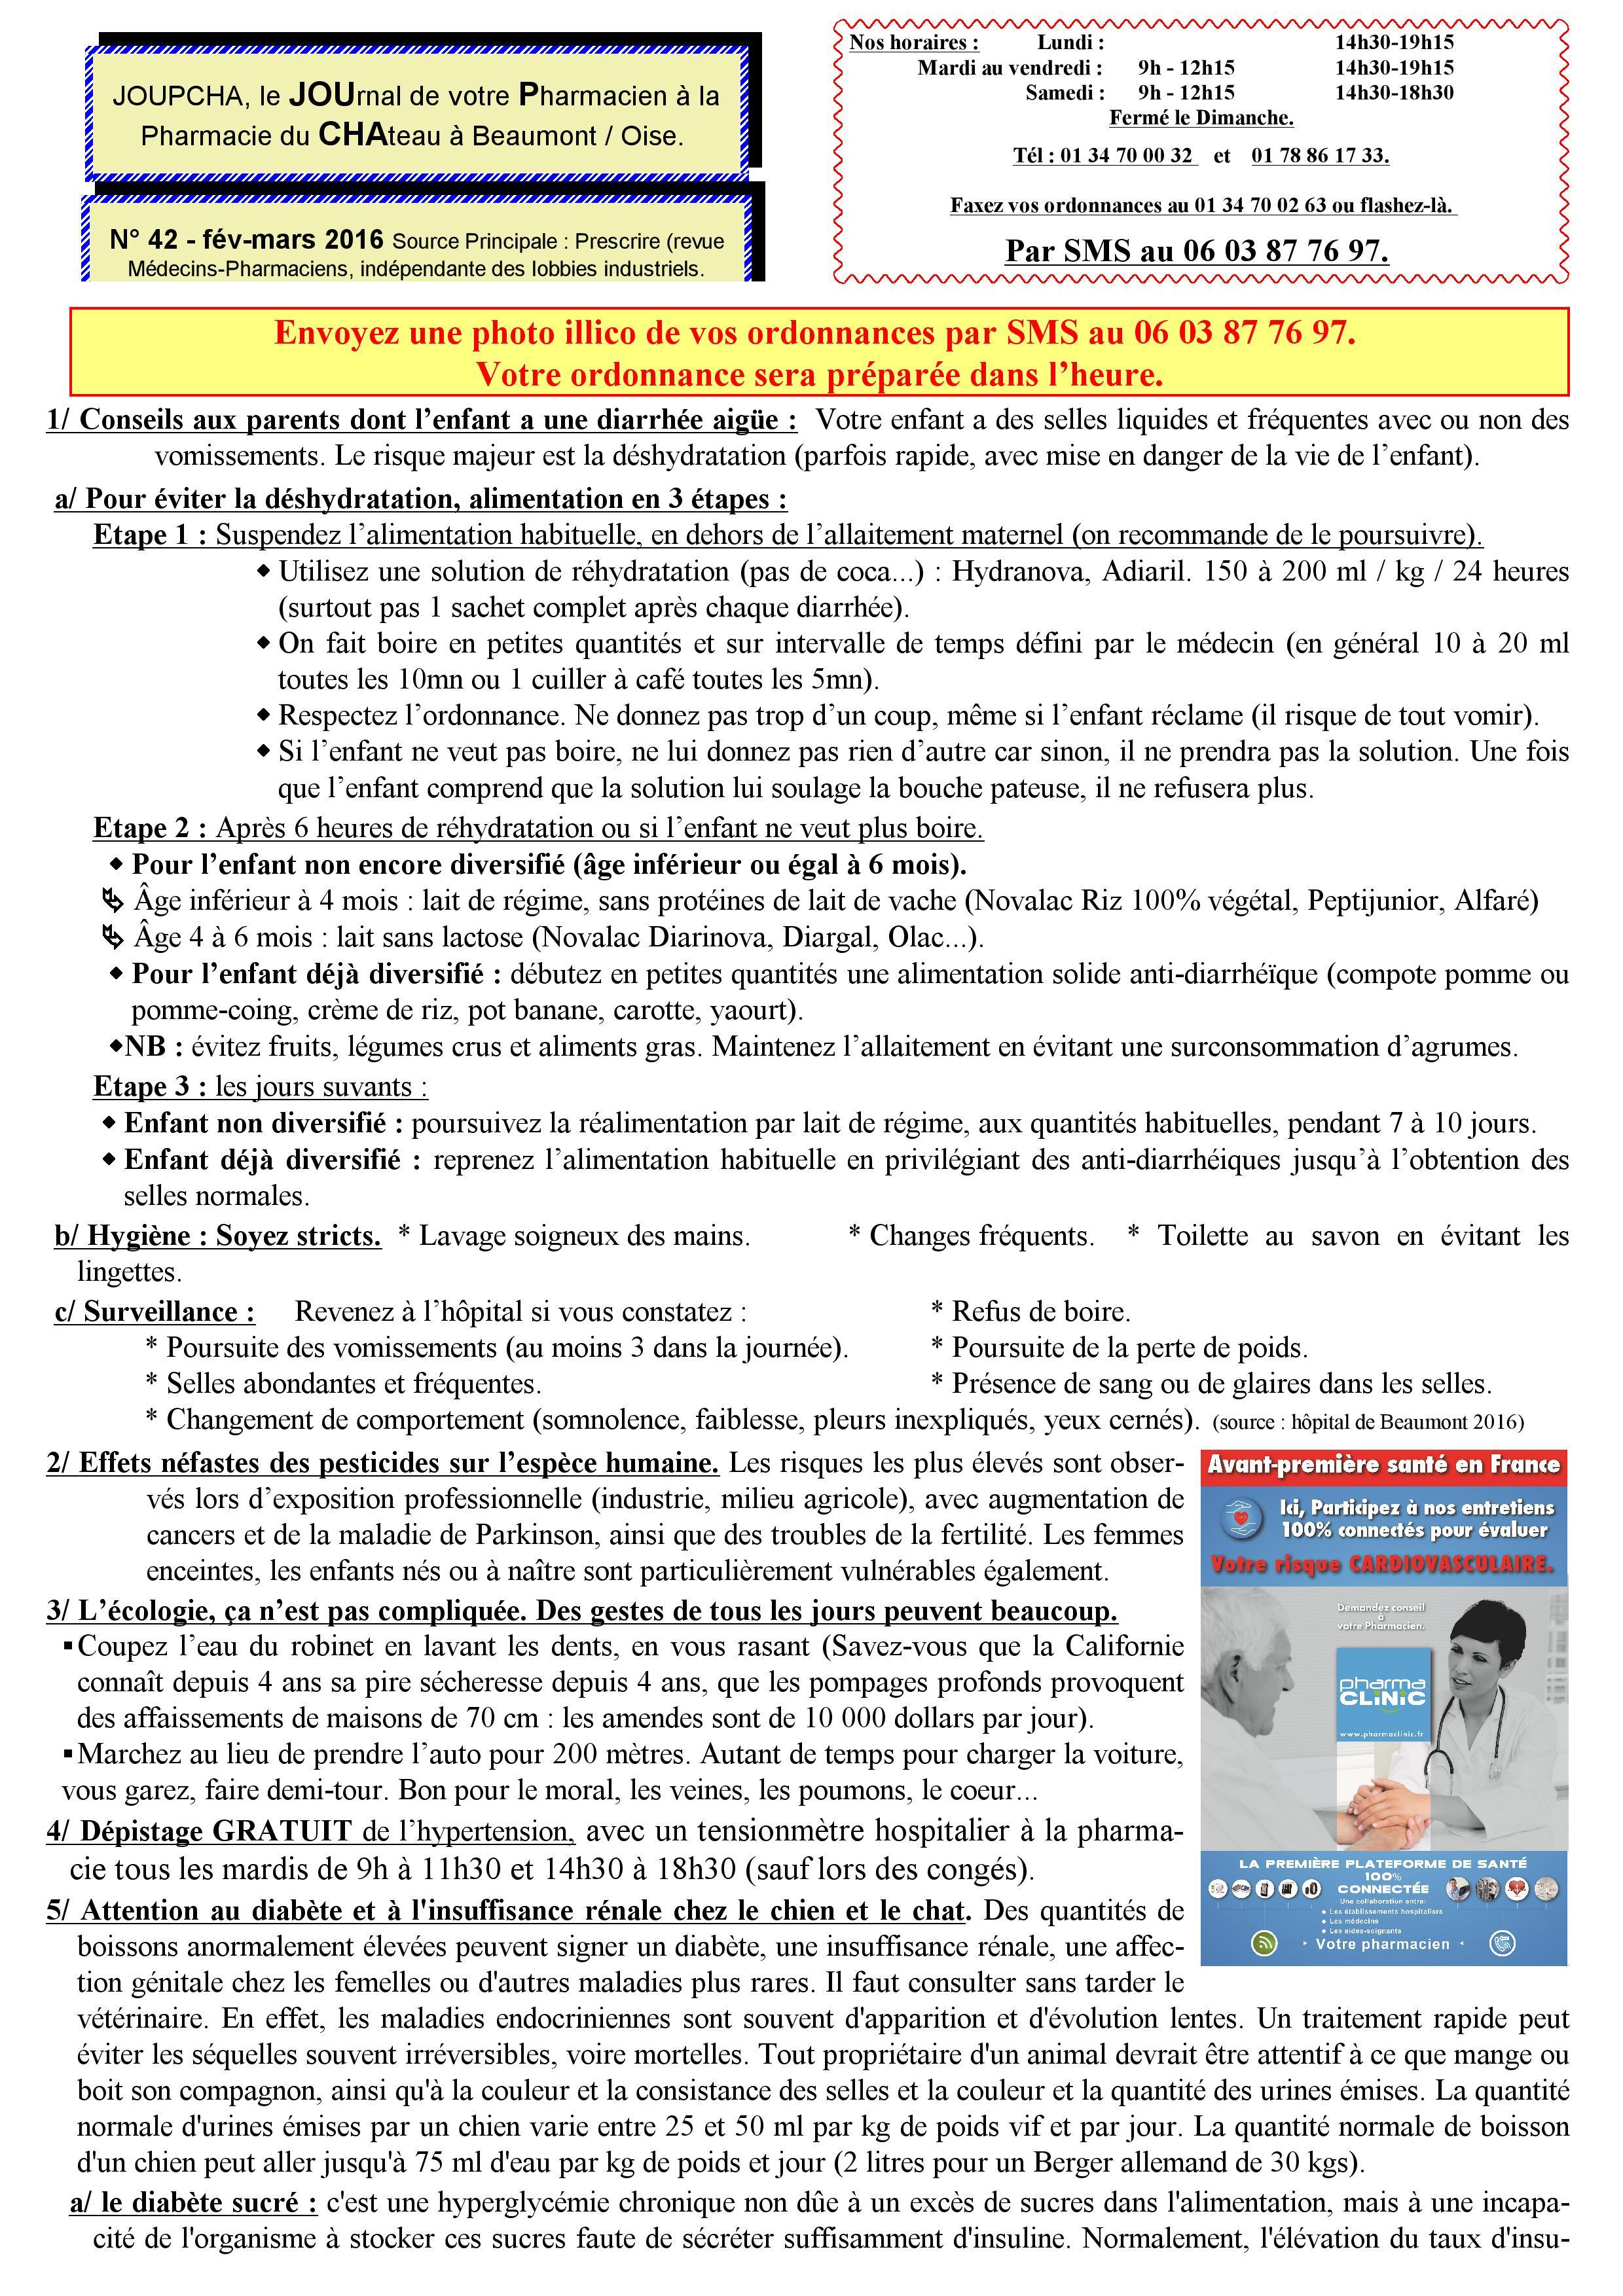 2016_02 joupcha 42    28-page-001.jpg